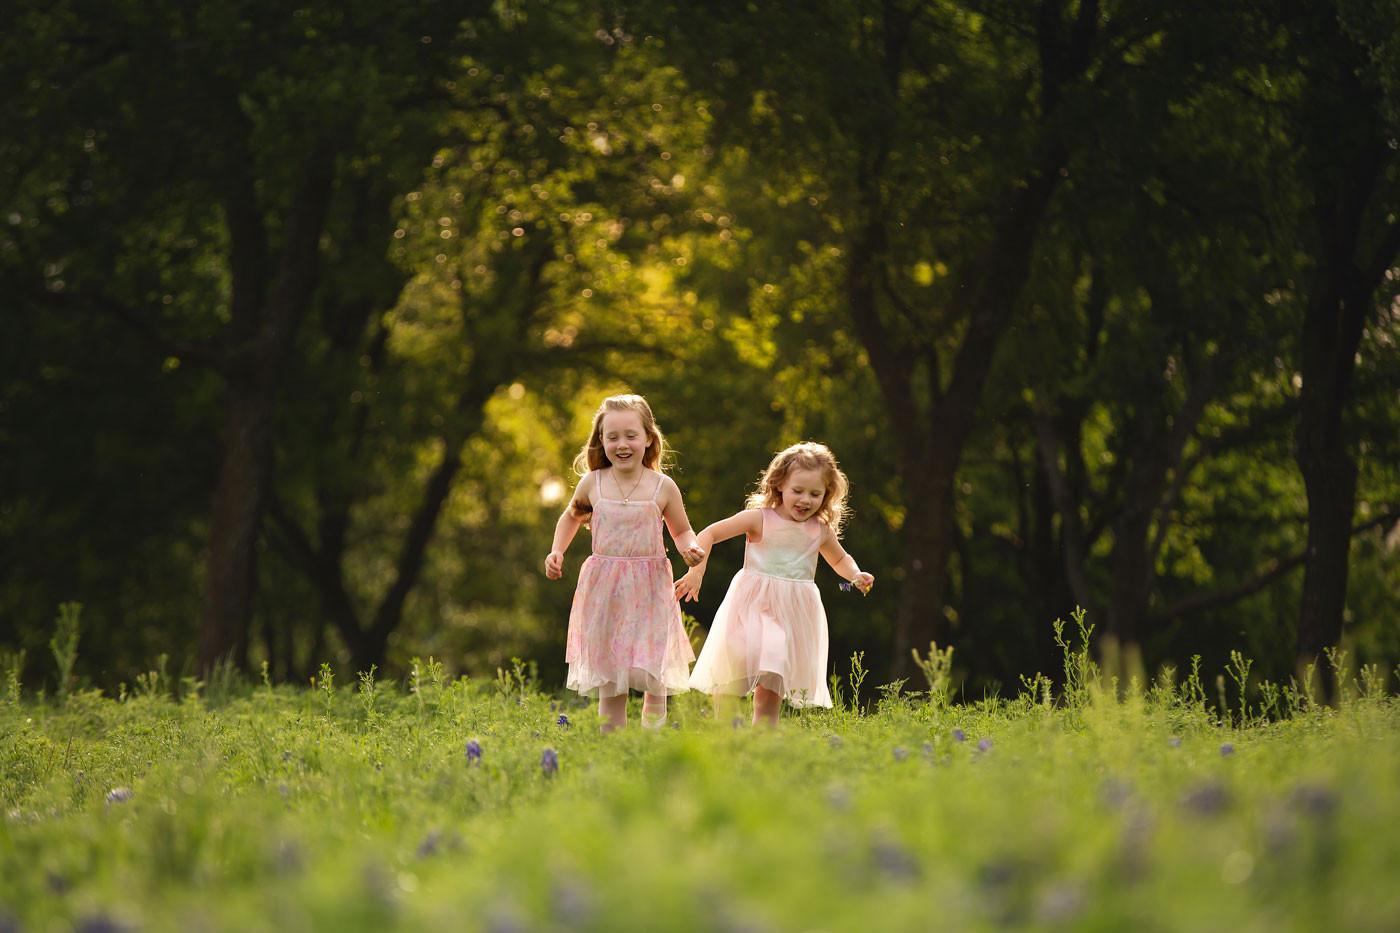 Plano-child-photographer-4.jpg